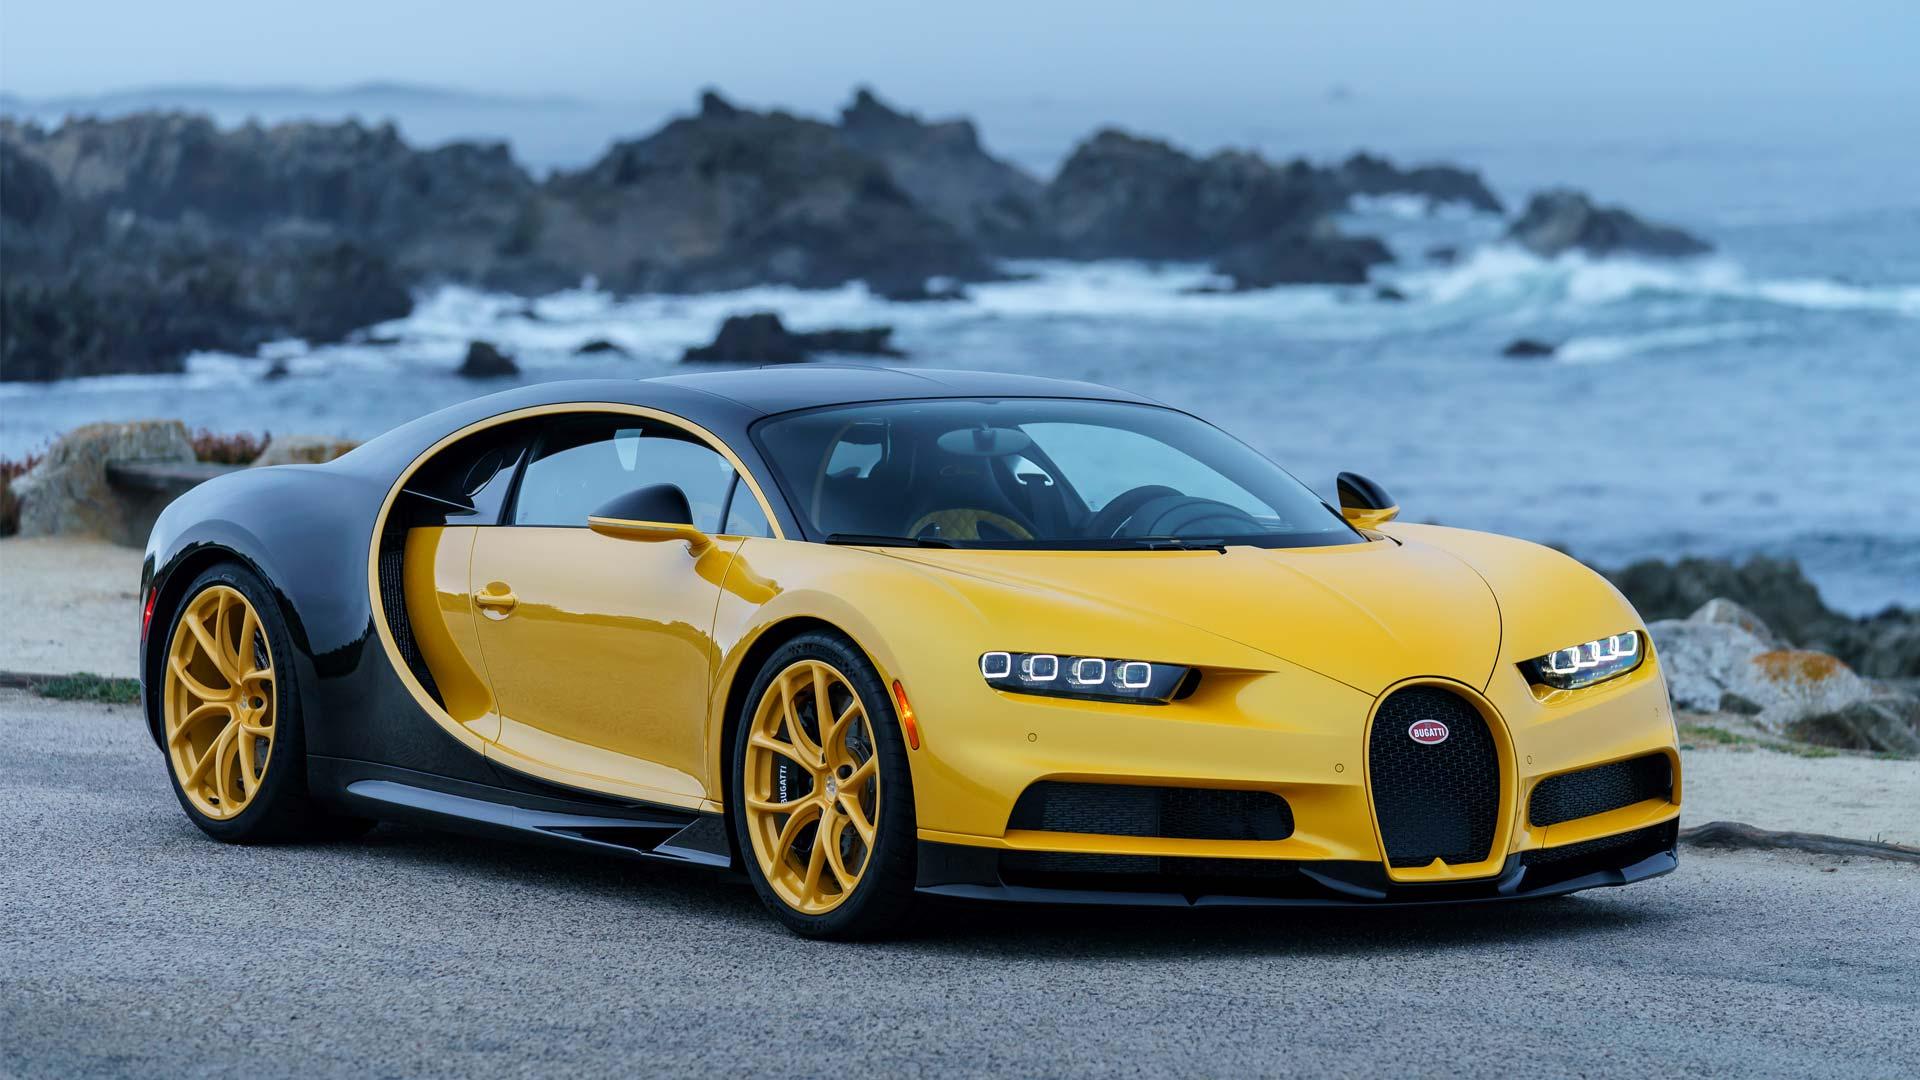 Bugatti-Chiron-US Fabulous Bugatti Veyron Price In south Africa Cars Trend